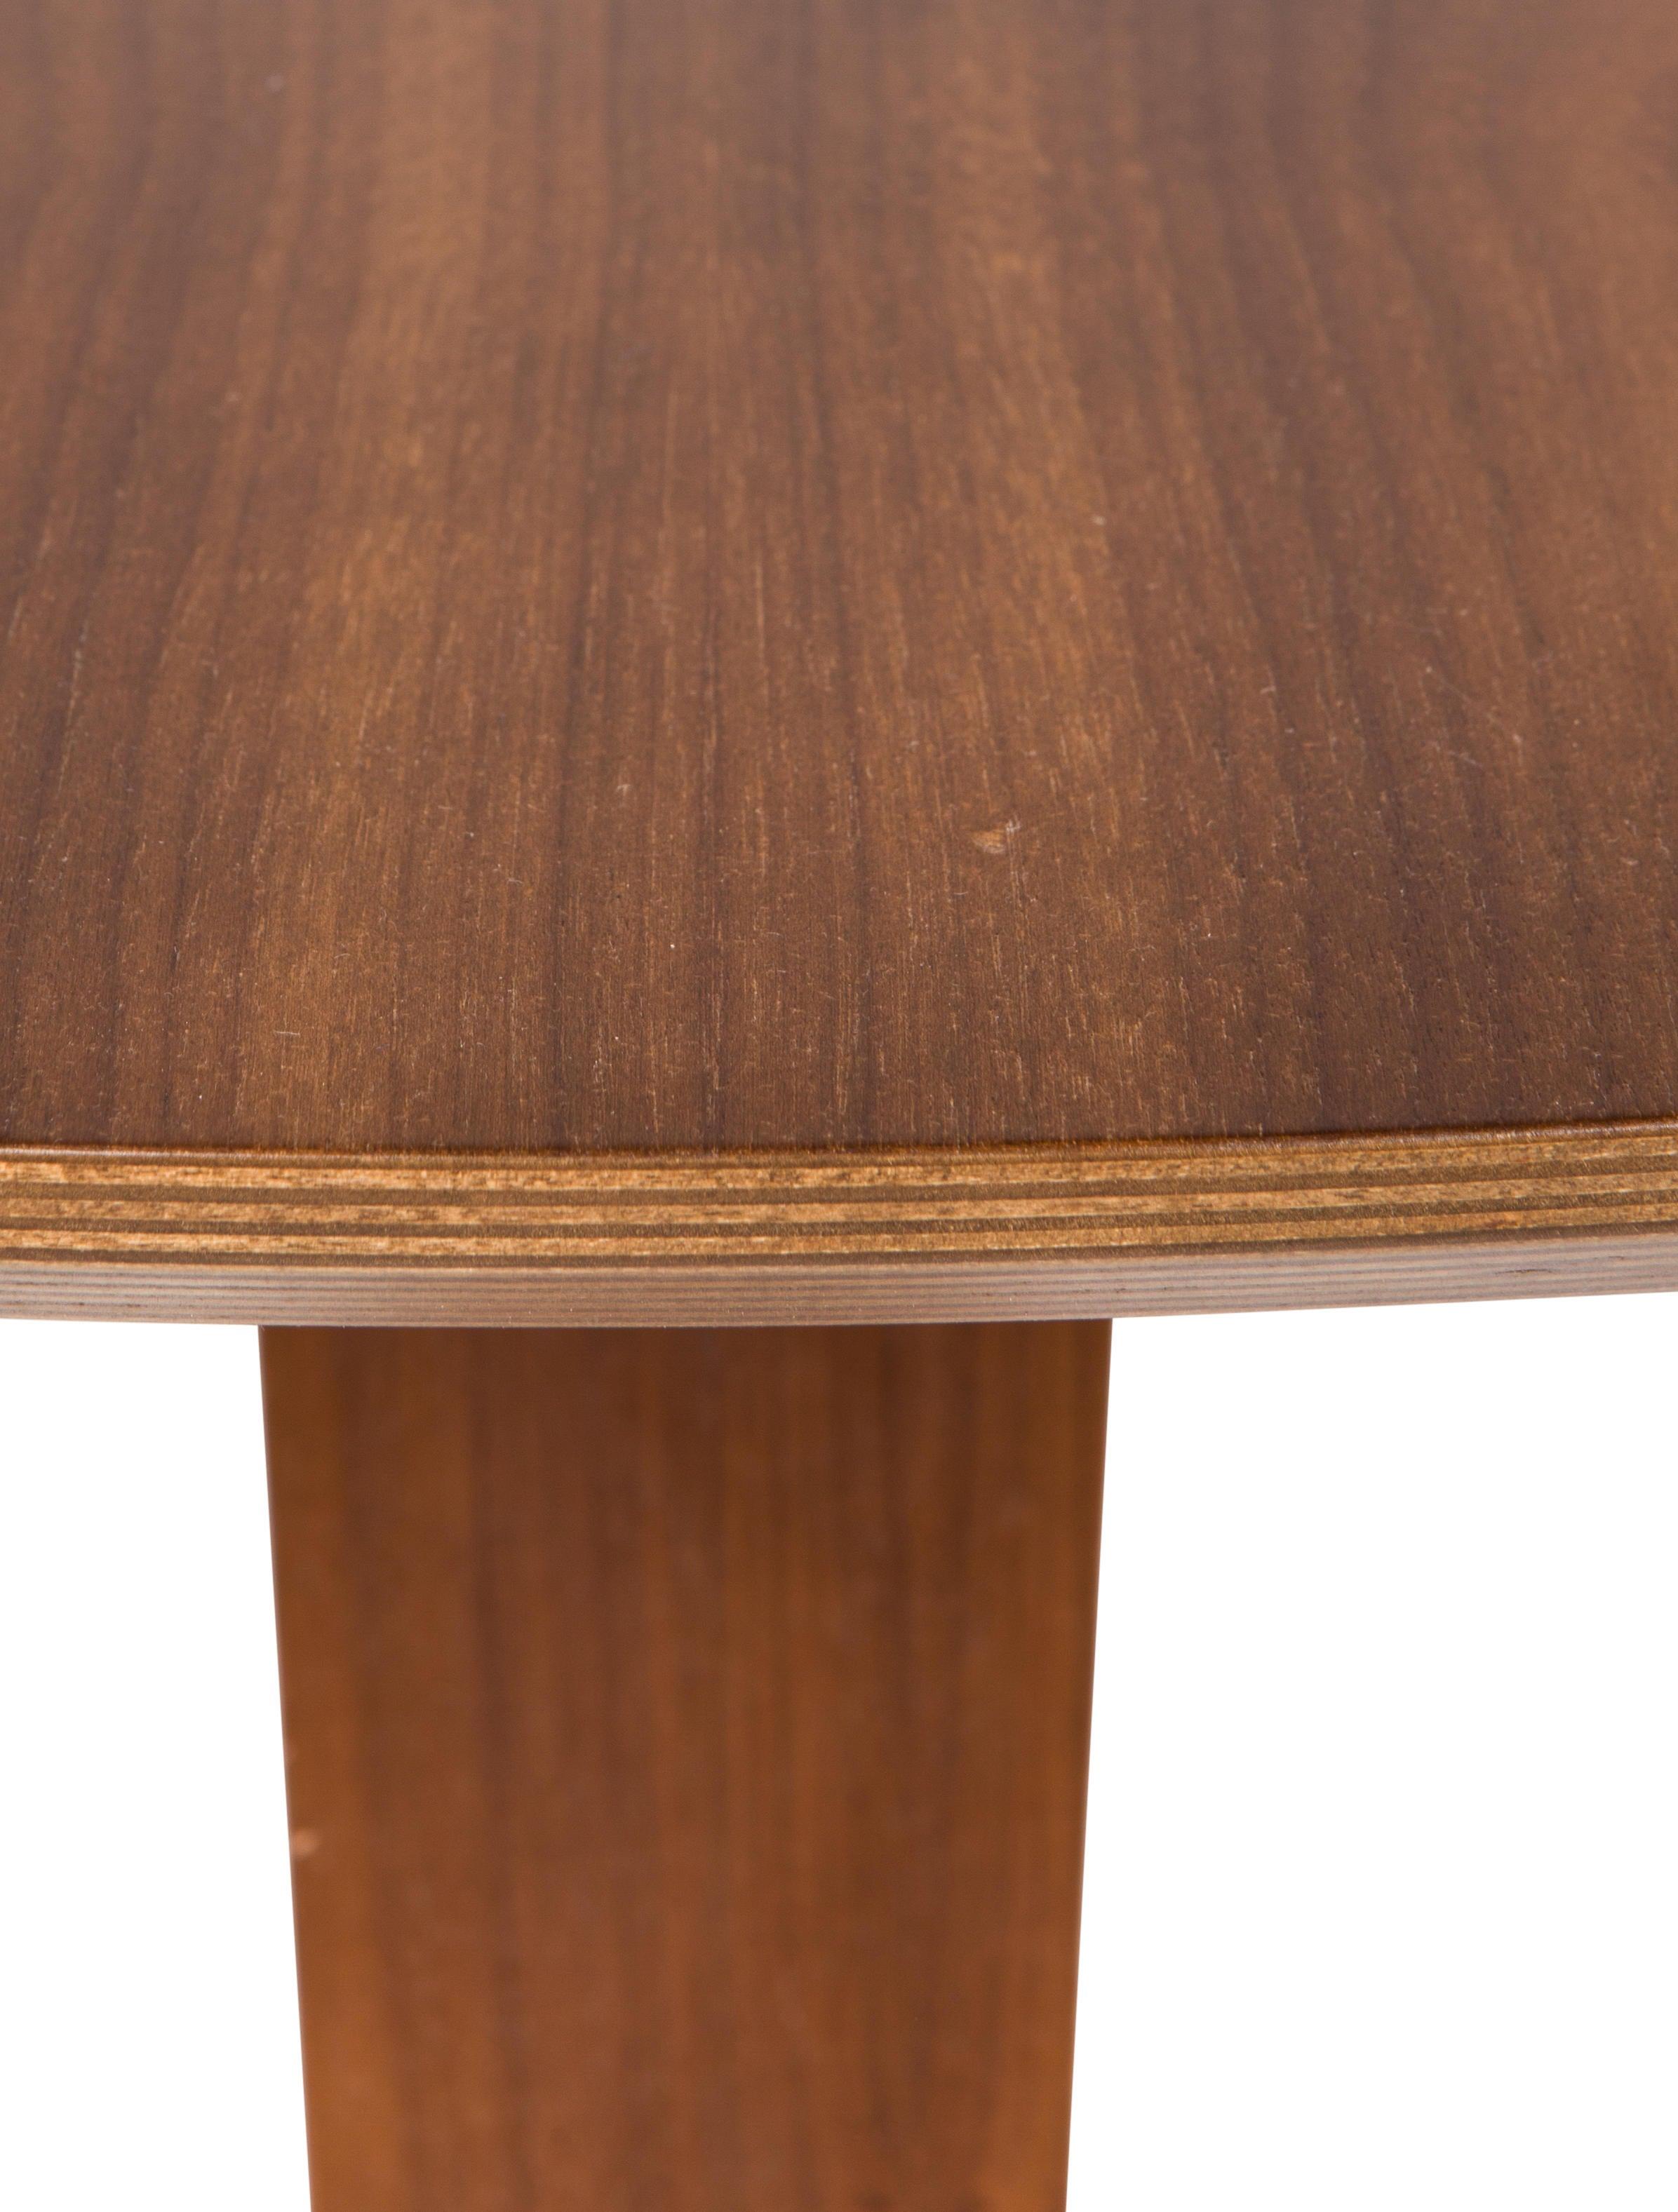 Norman Cherner Walnut Cherner Round Dining Table Furniture - Cherner dining table